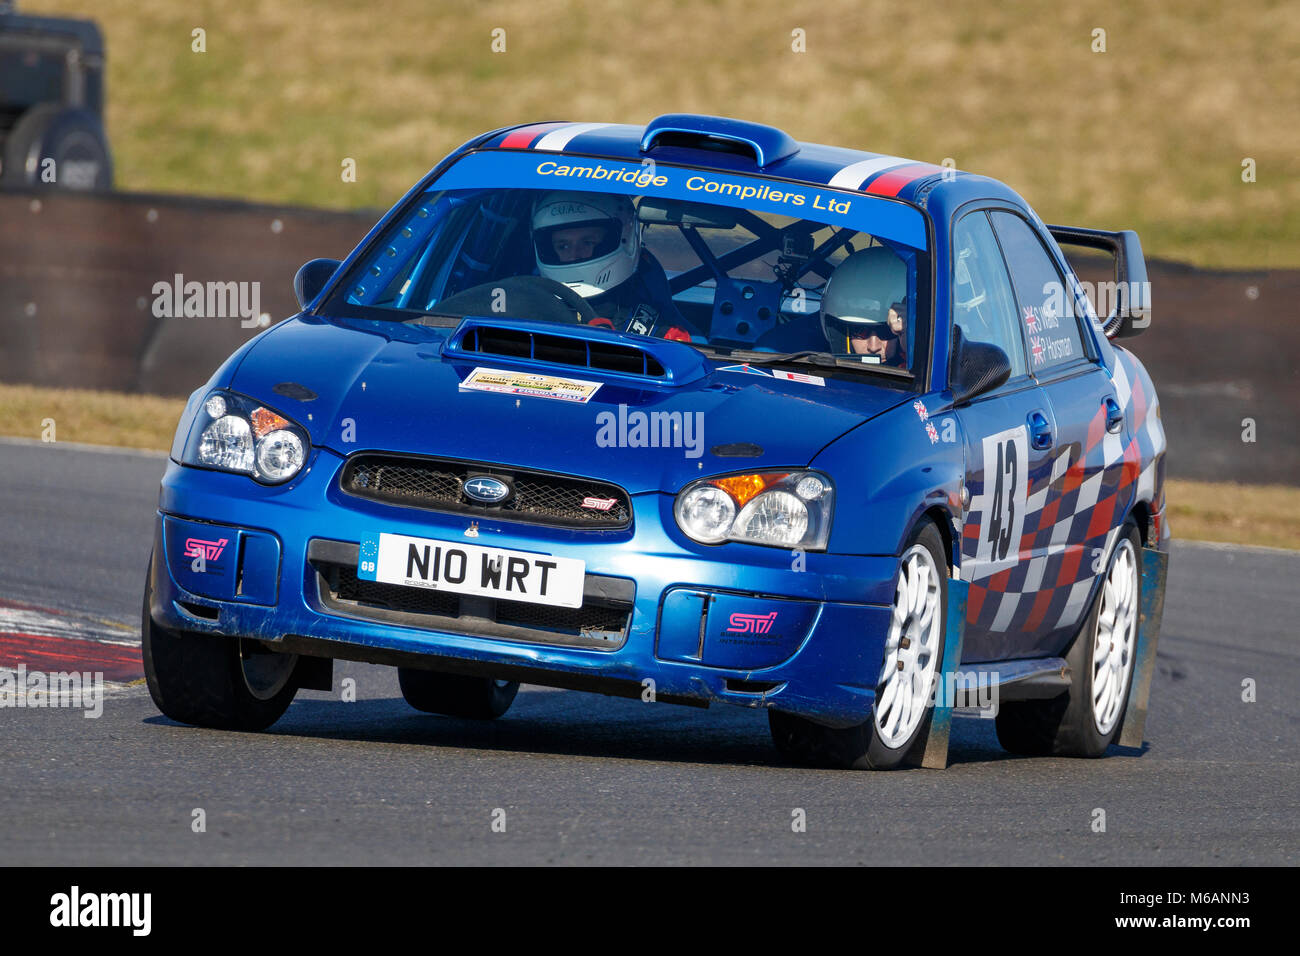 Simon Wallis und Peter Horsman in den Subaru Impreza während der Motorsport News Snetterton Bühne Rallye Stockbild